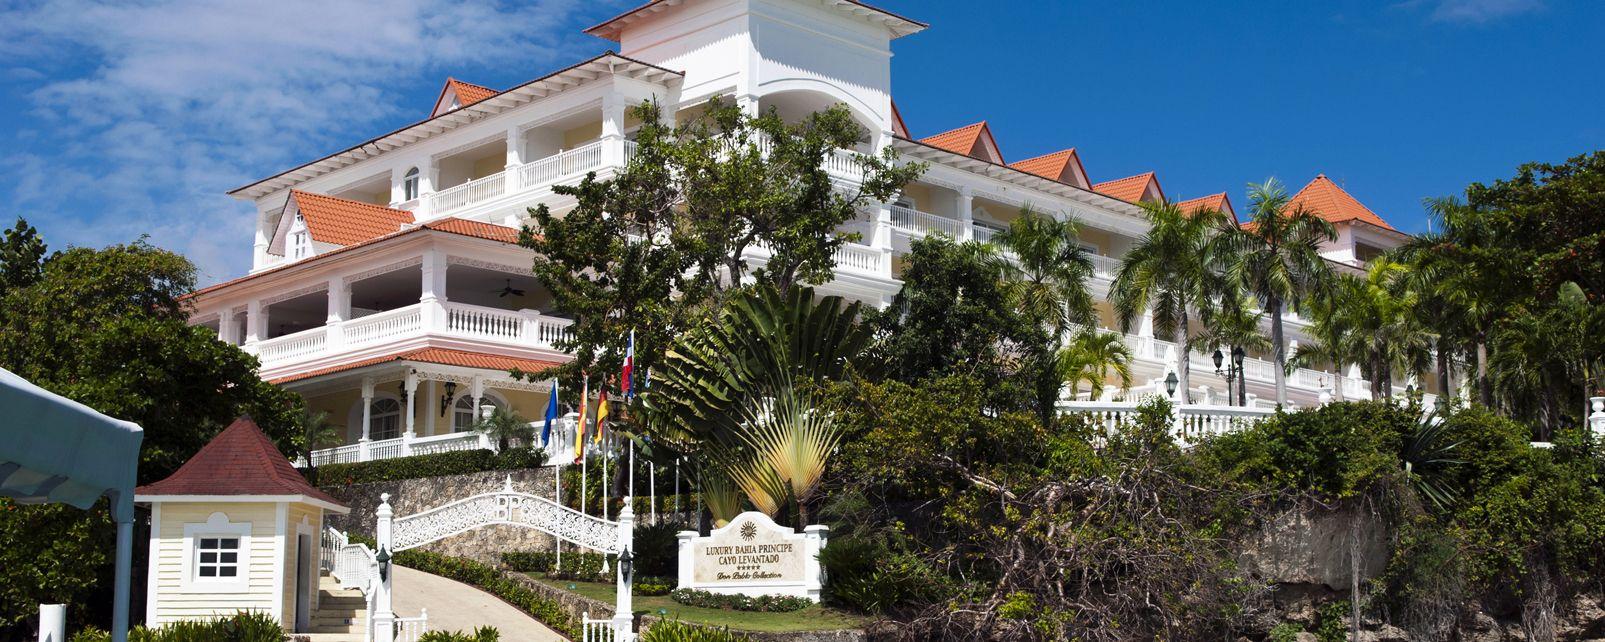 H tel luxury bahia principe cayo levantado samana for Hotel luxury cayo levantado